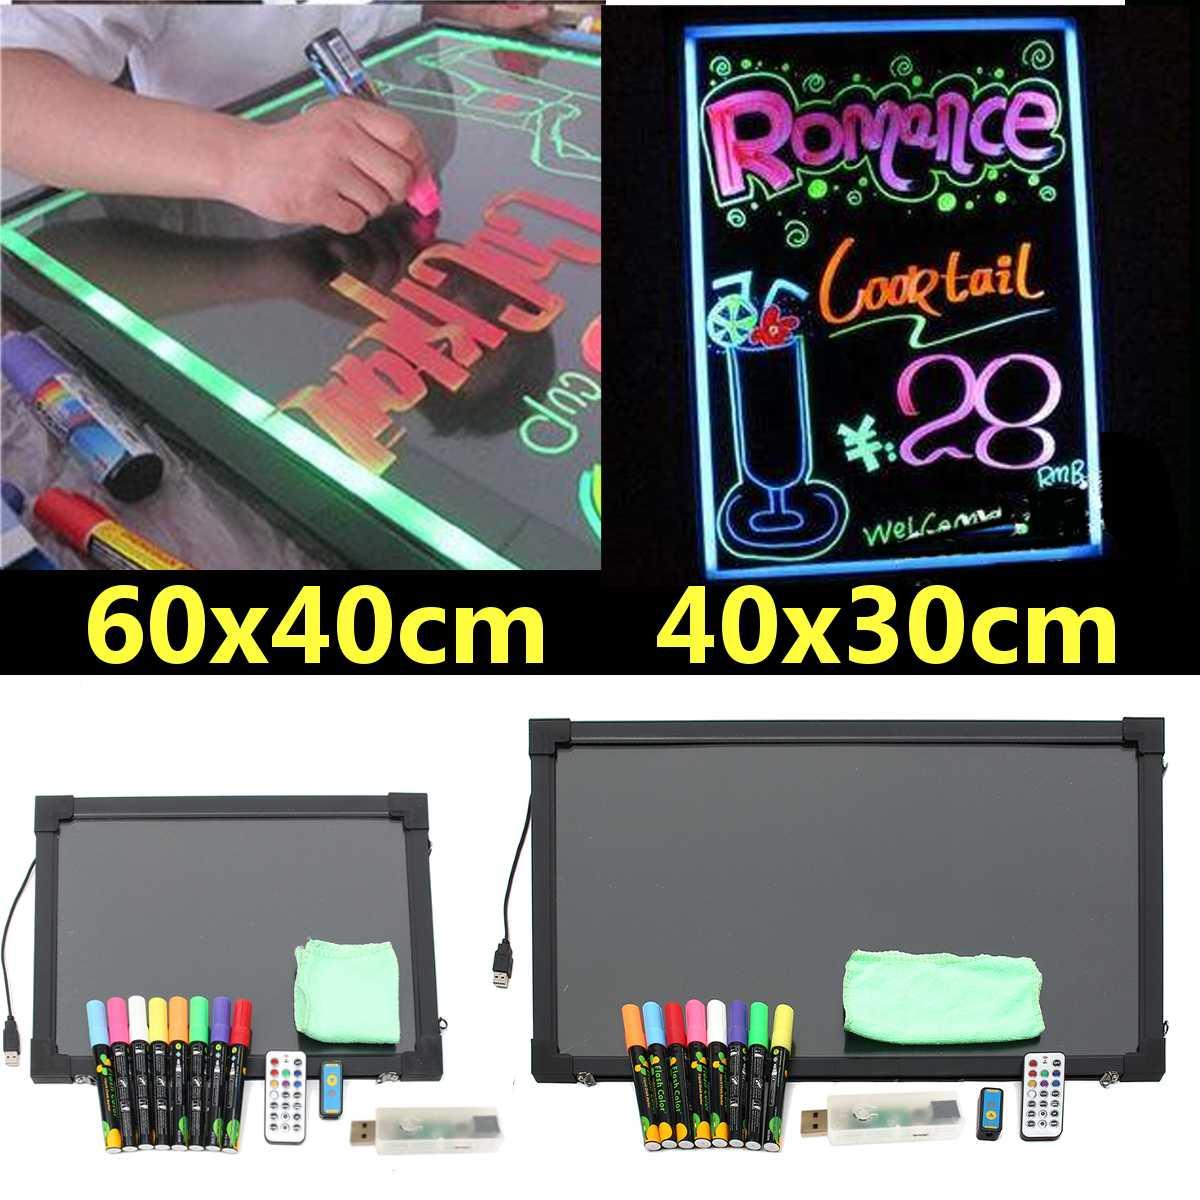 Tablero de escritura LED borrable + 8 bolígrafo fluorescente LED parpadeante de neón luminoso panel de publicidad LED mensaje menú signo de escritura tablero